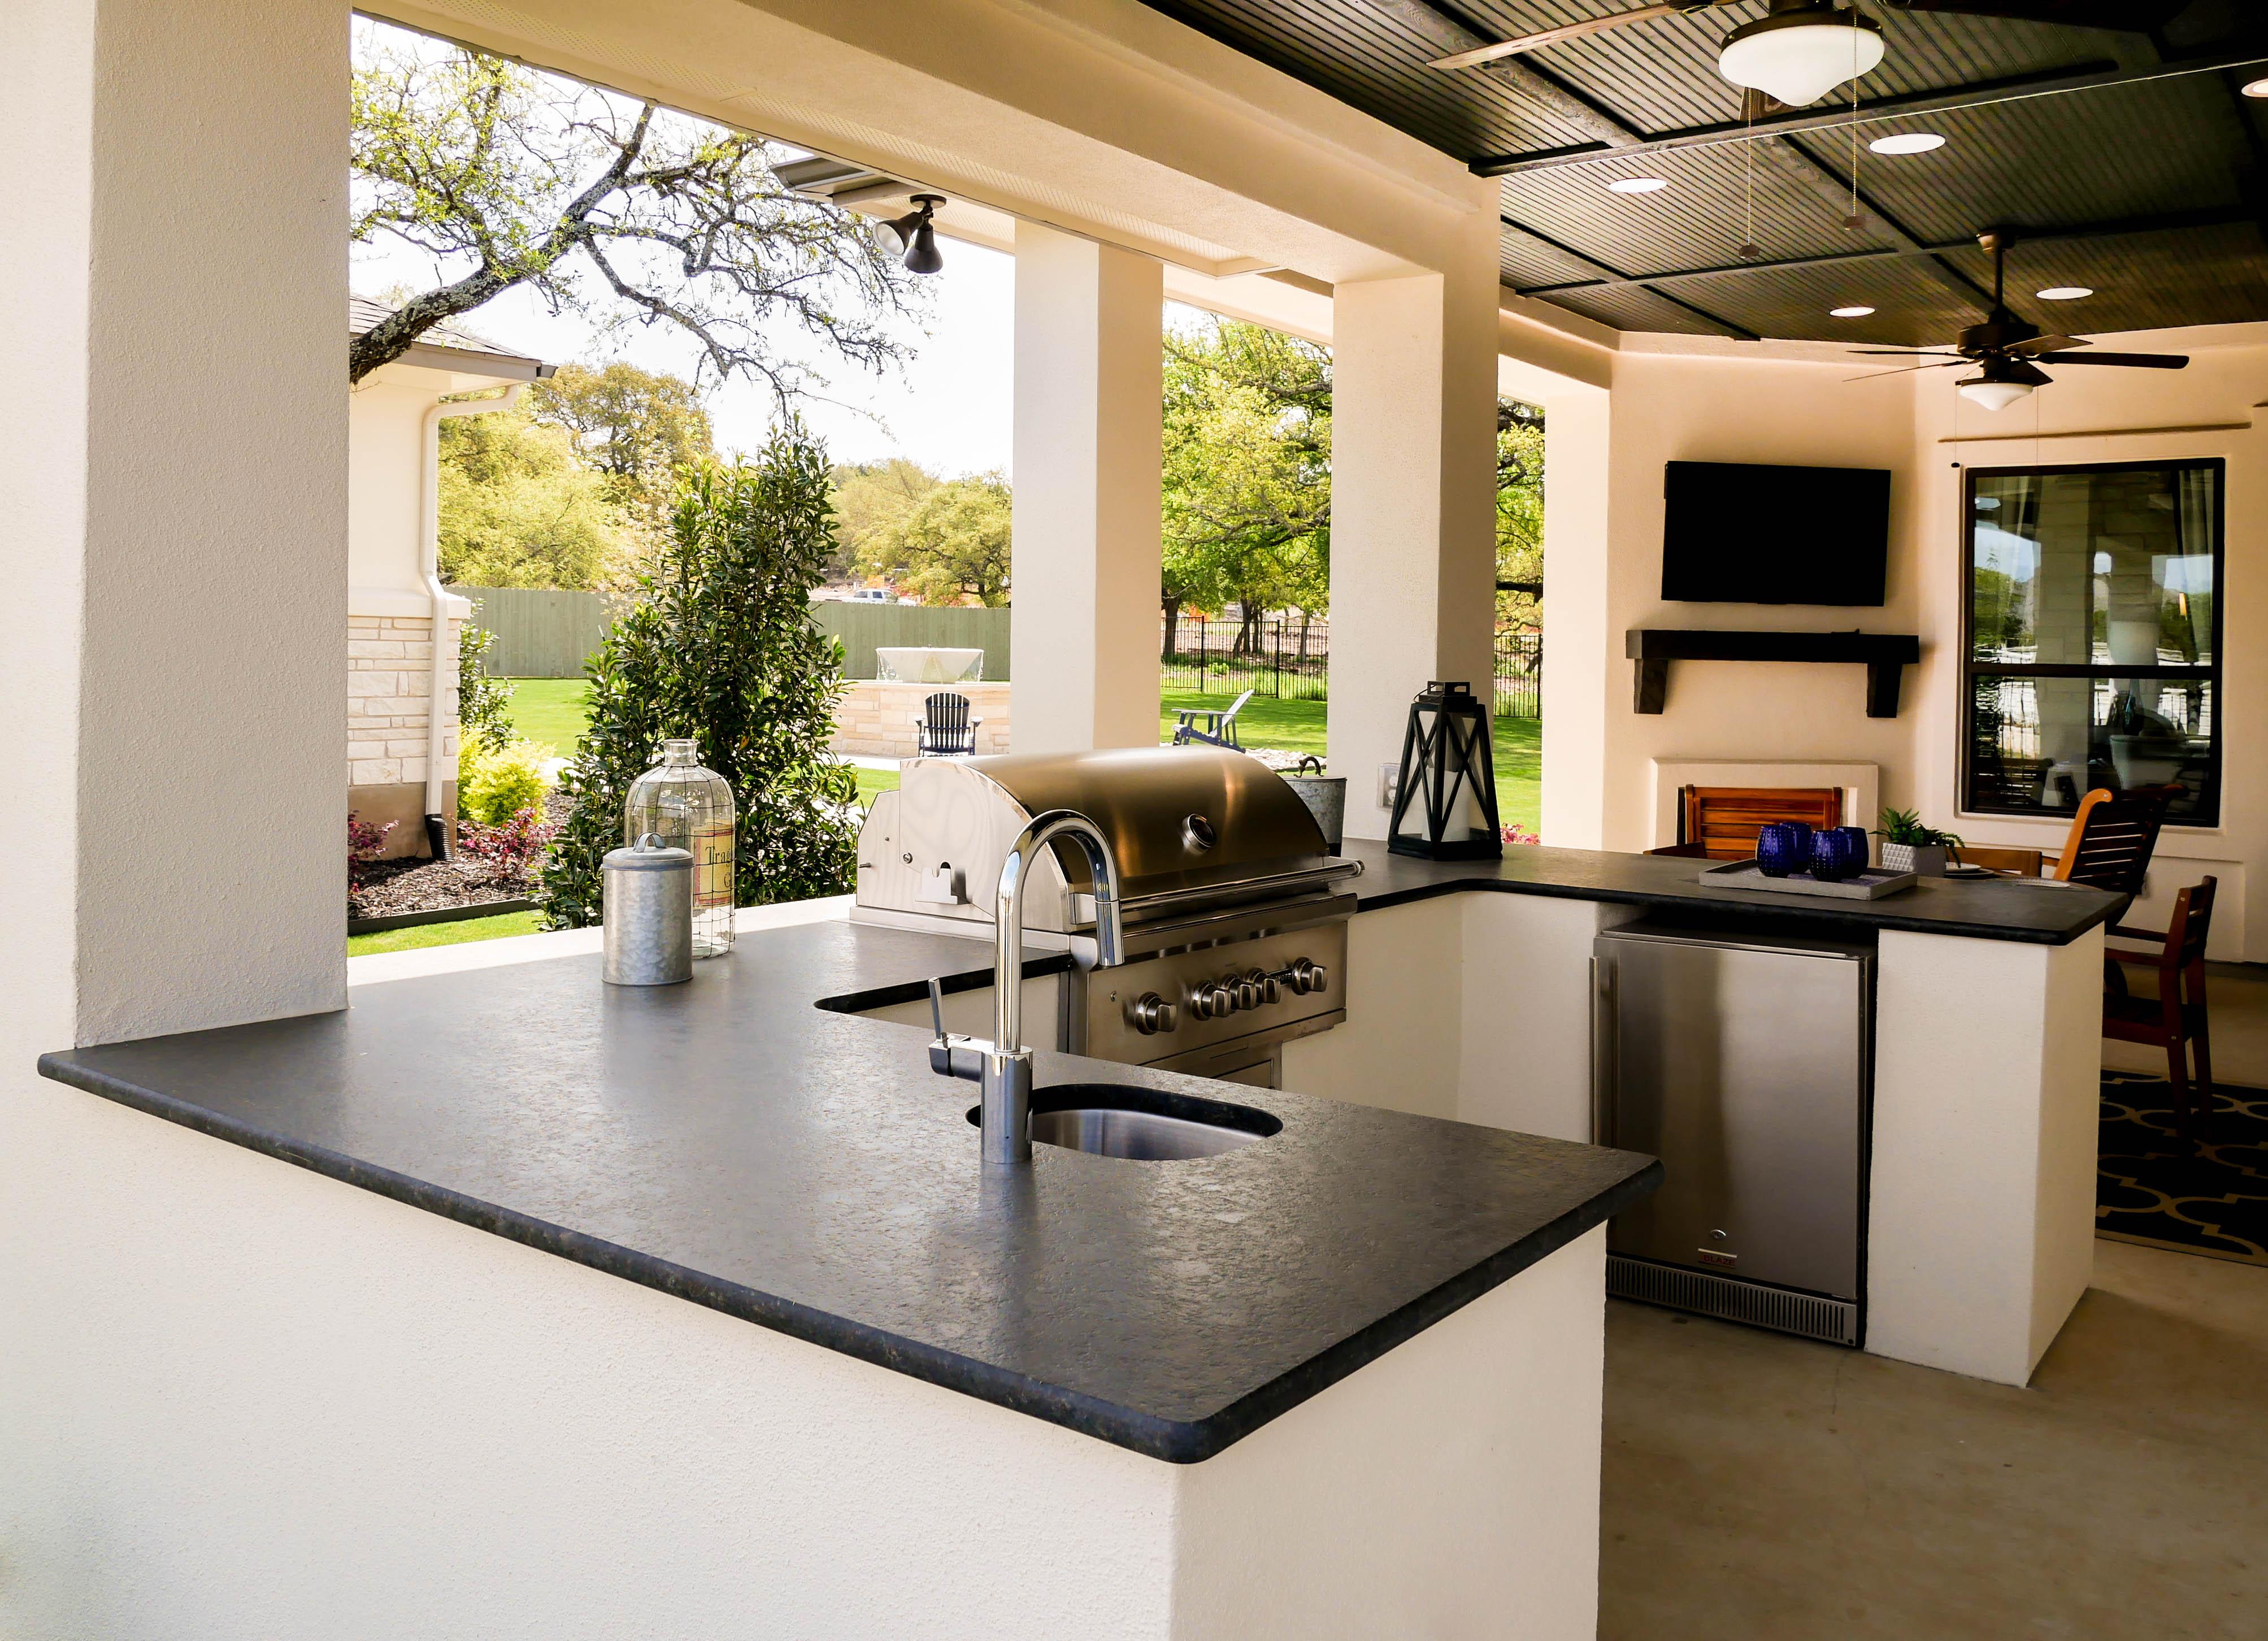 granite countertops outdoor kitchen austin texas